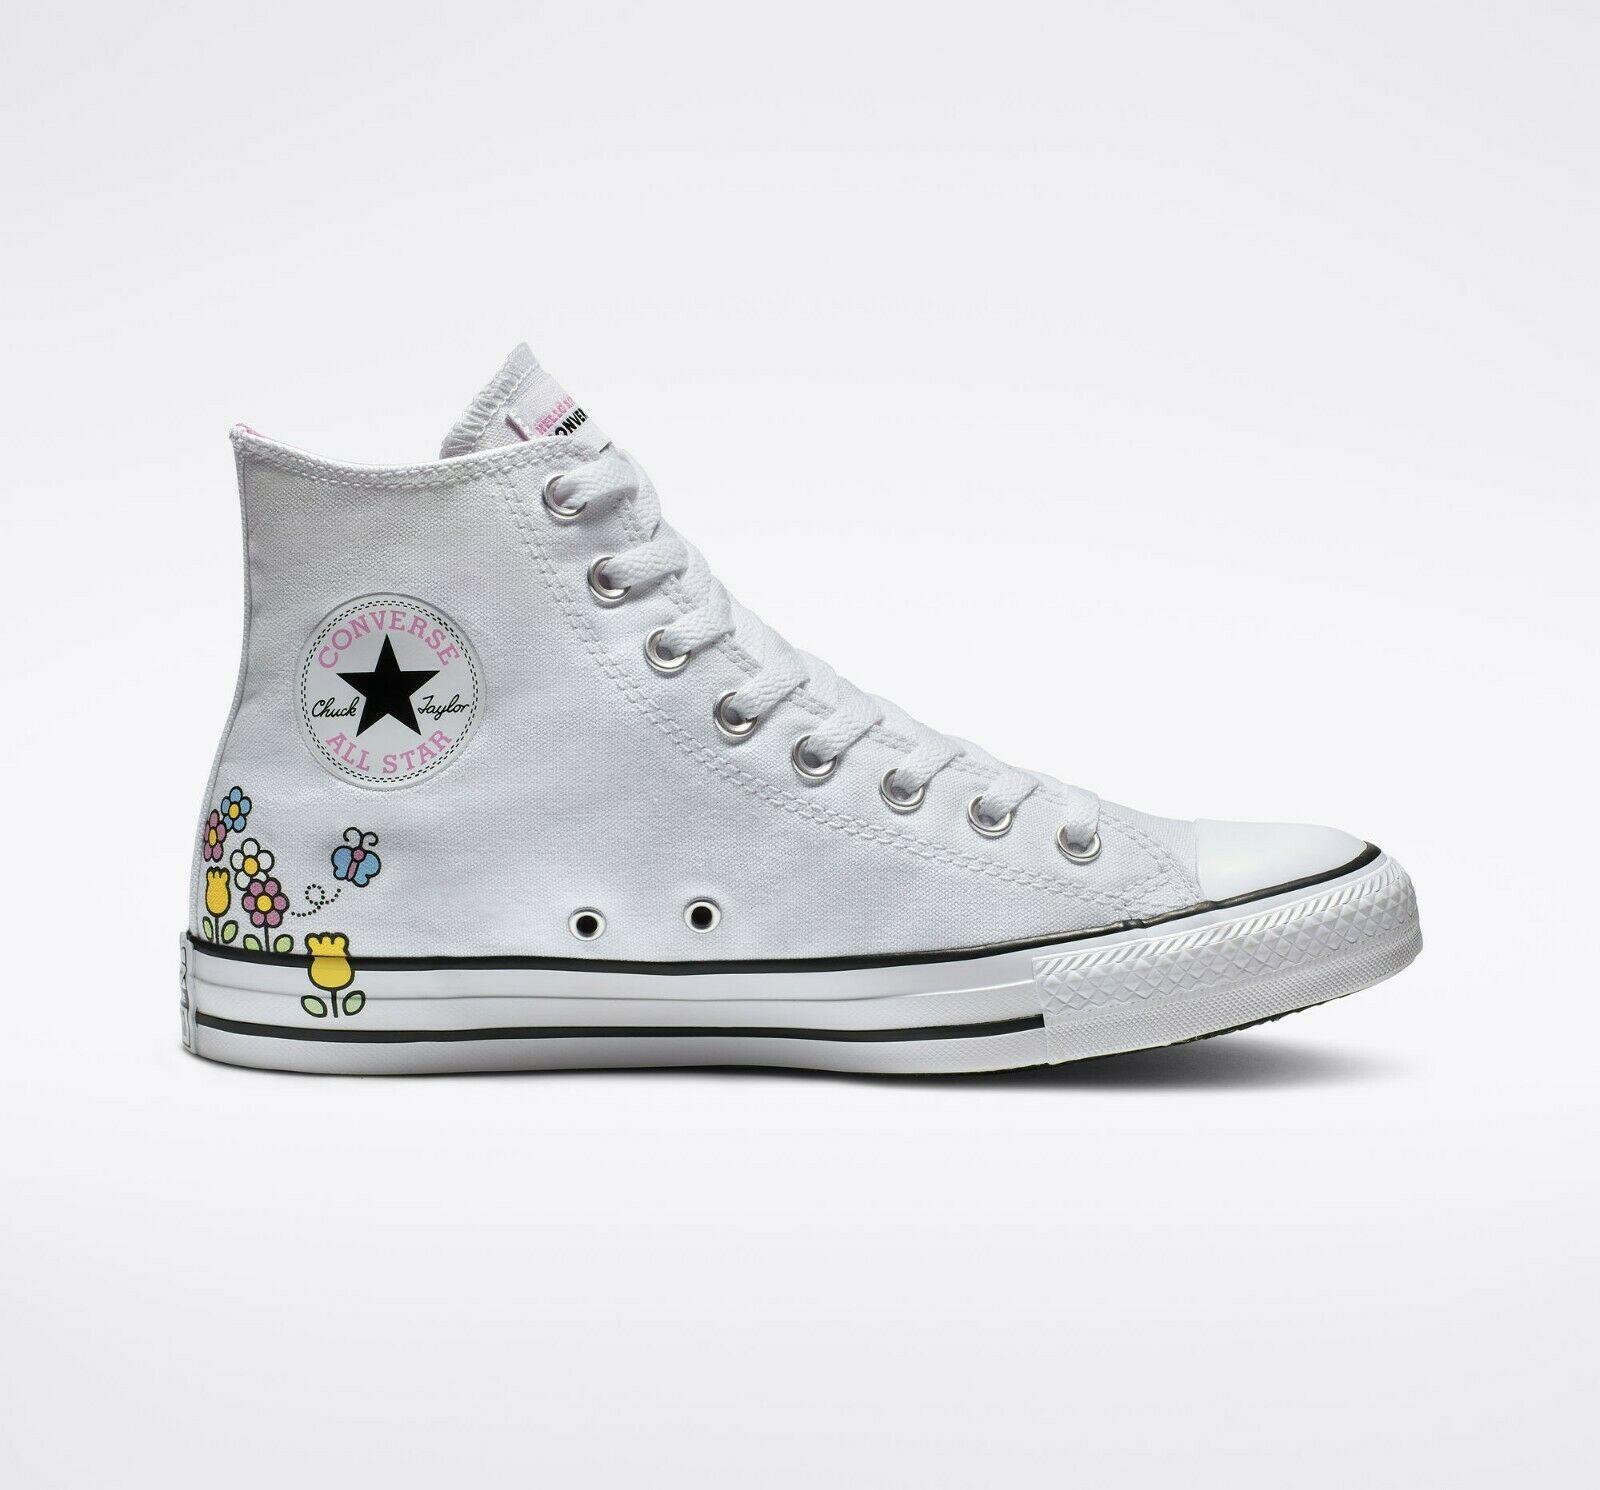 Converse x Hello Kitty Chuck Taylor All Star High Top, 164629F Multi Sizes White